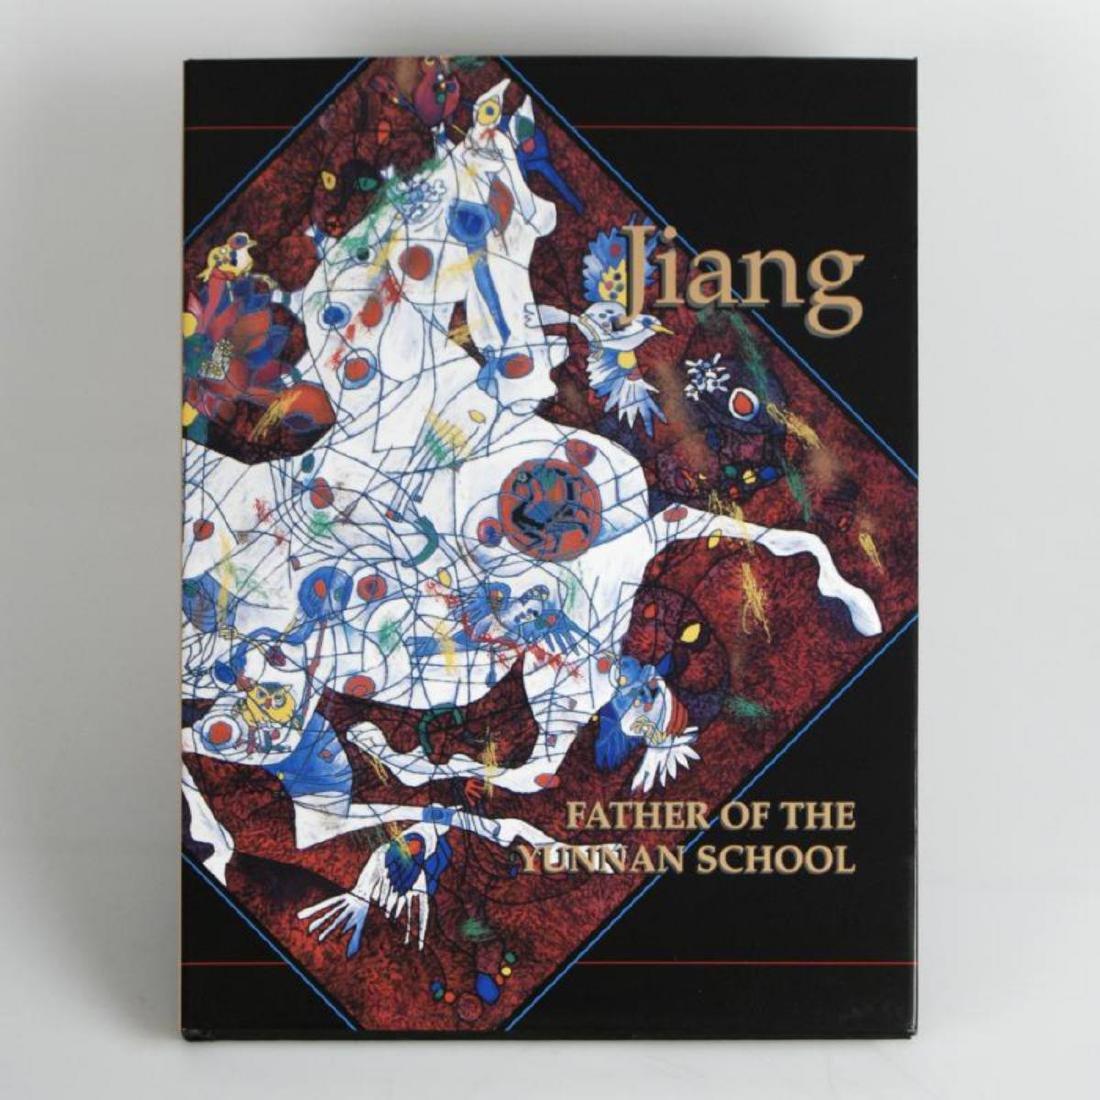 """Jiang - Father of Yunnan School"" This Fine Art Book"